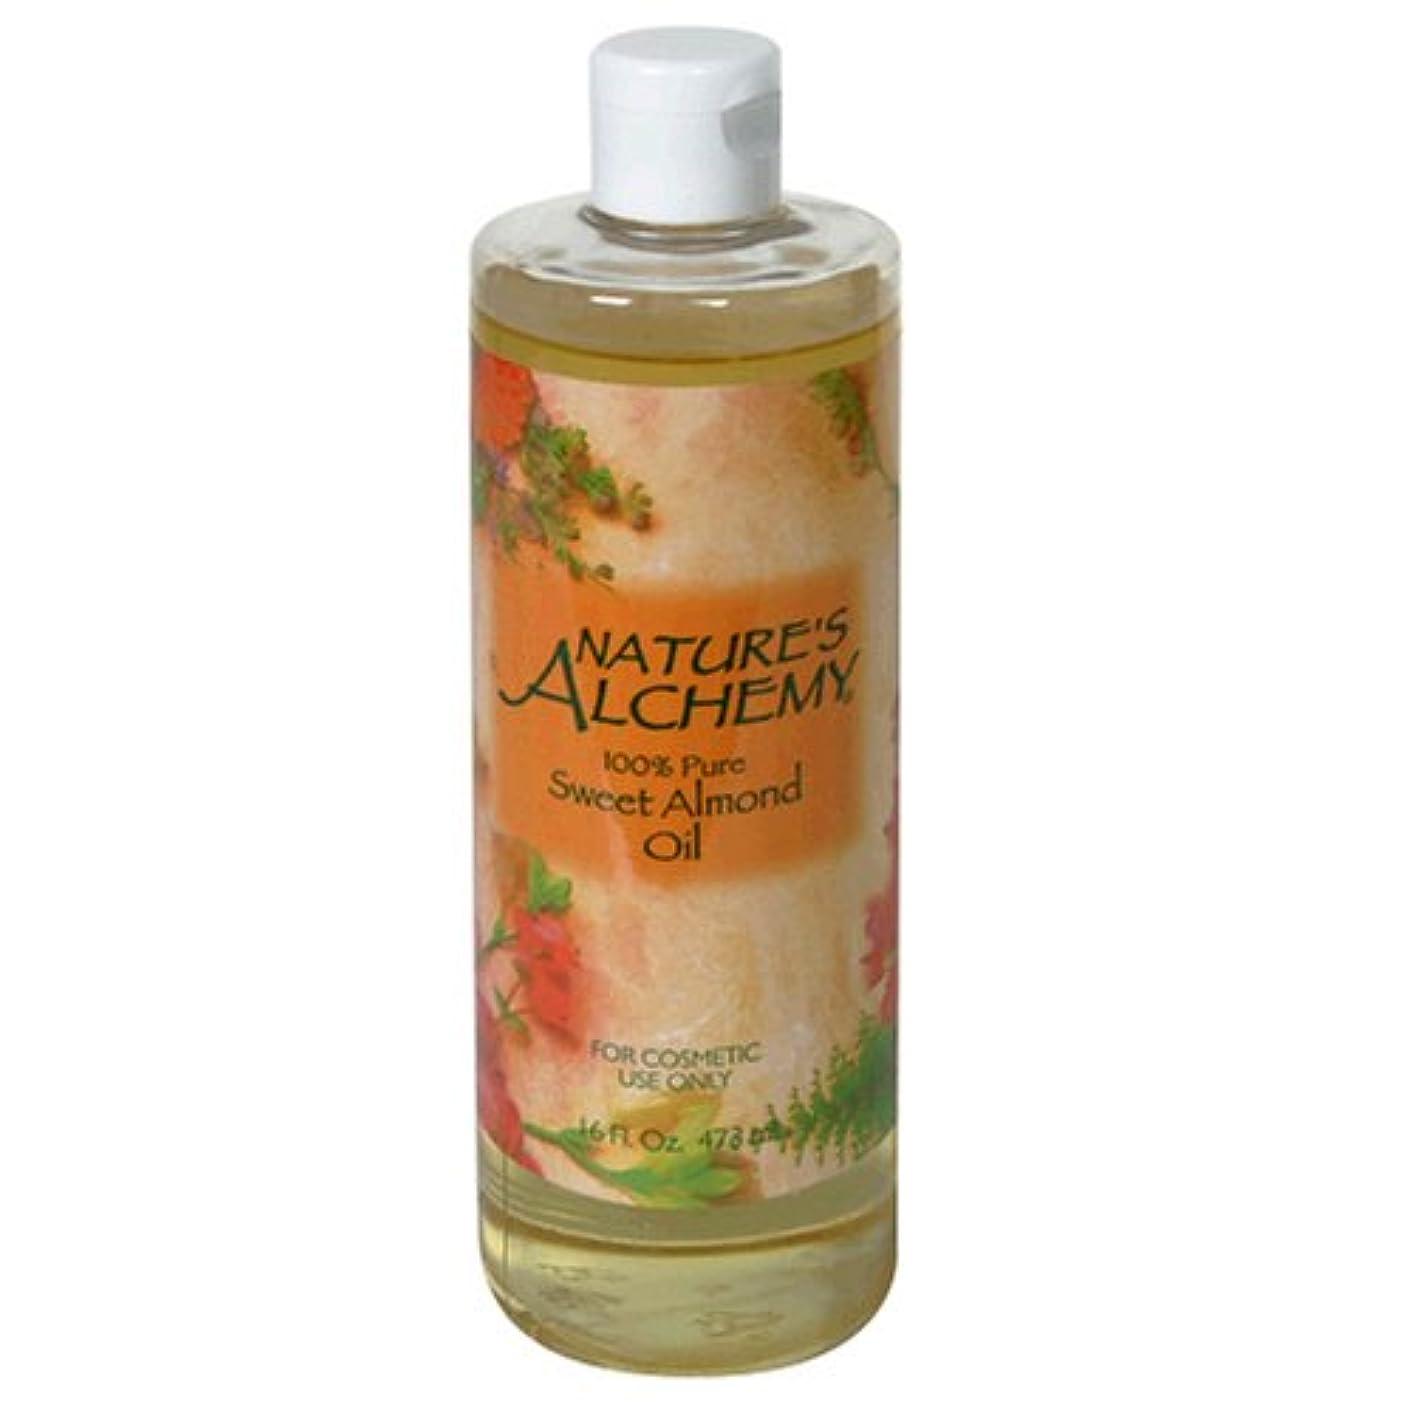 野な迫害歩道Nature's Alchemy Carrier Oil Sweet Almond 16oz